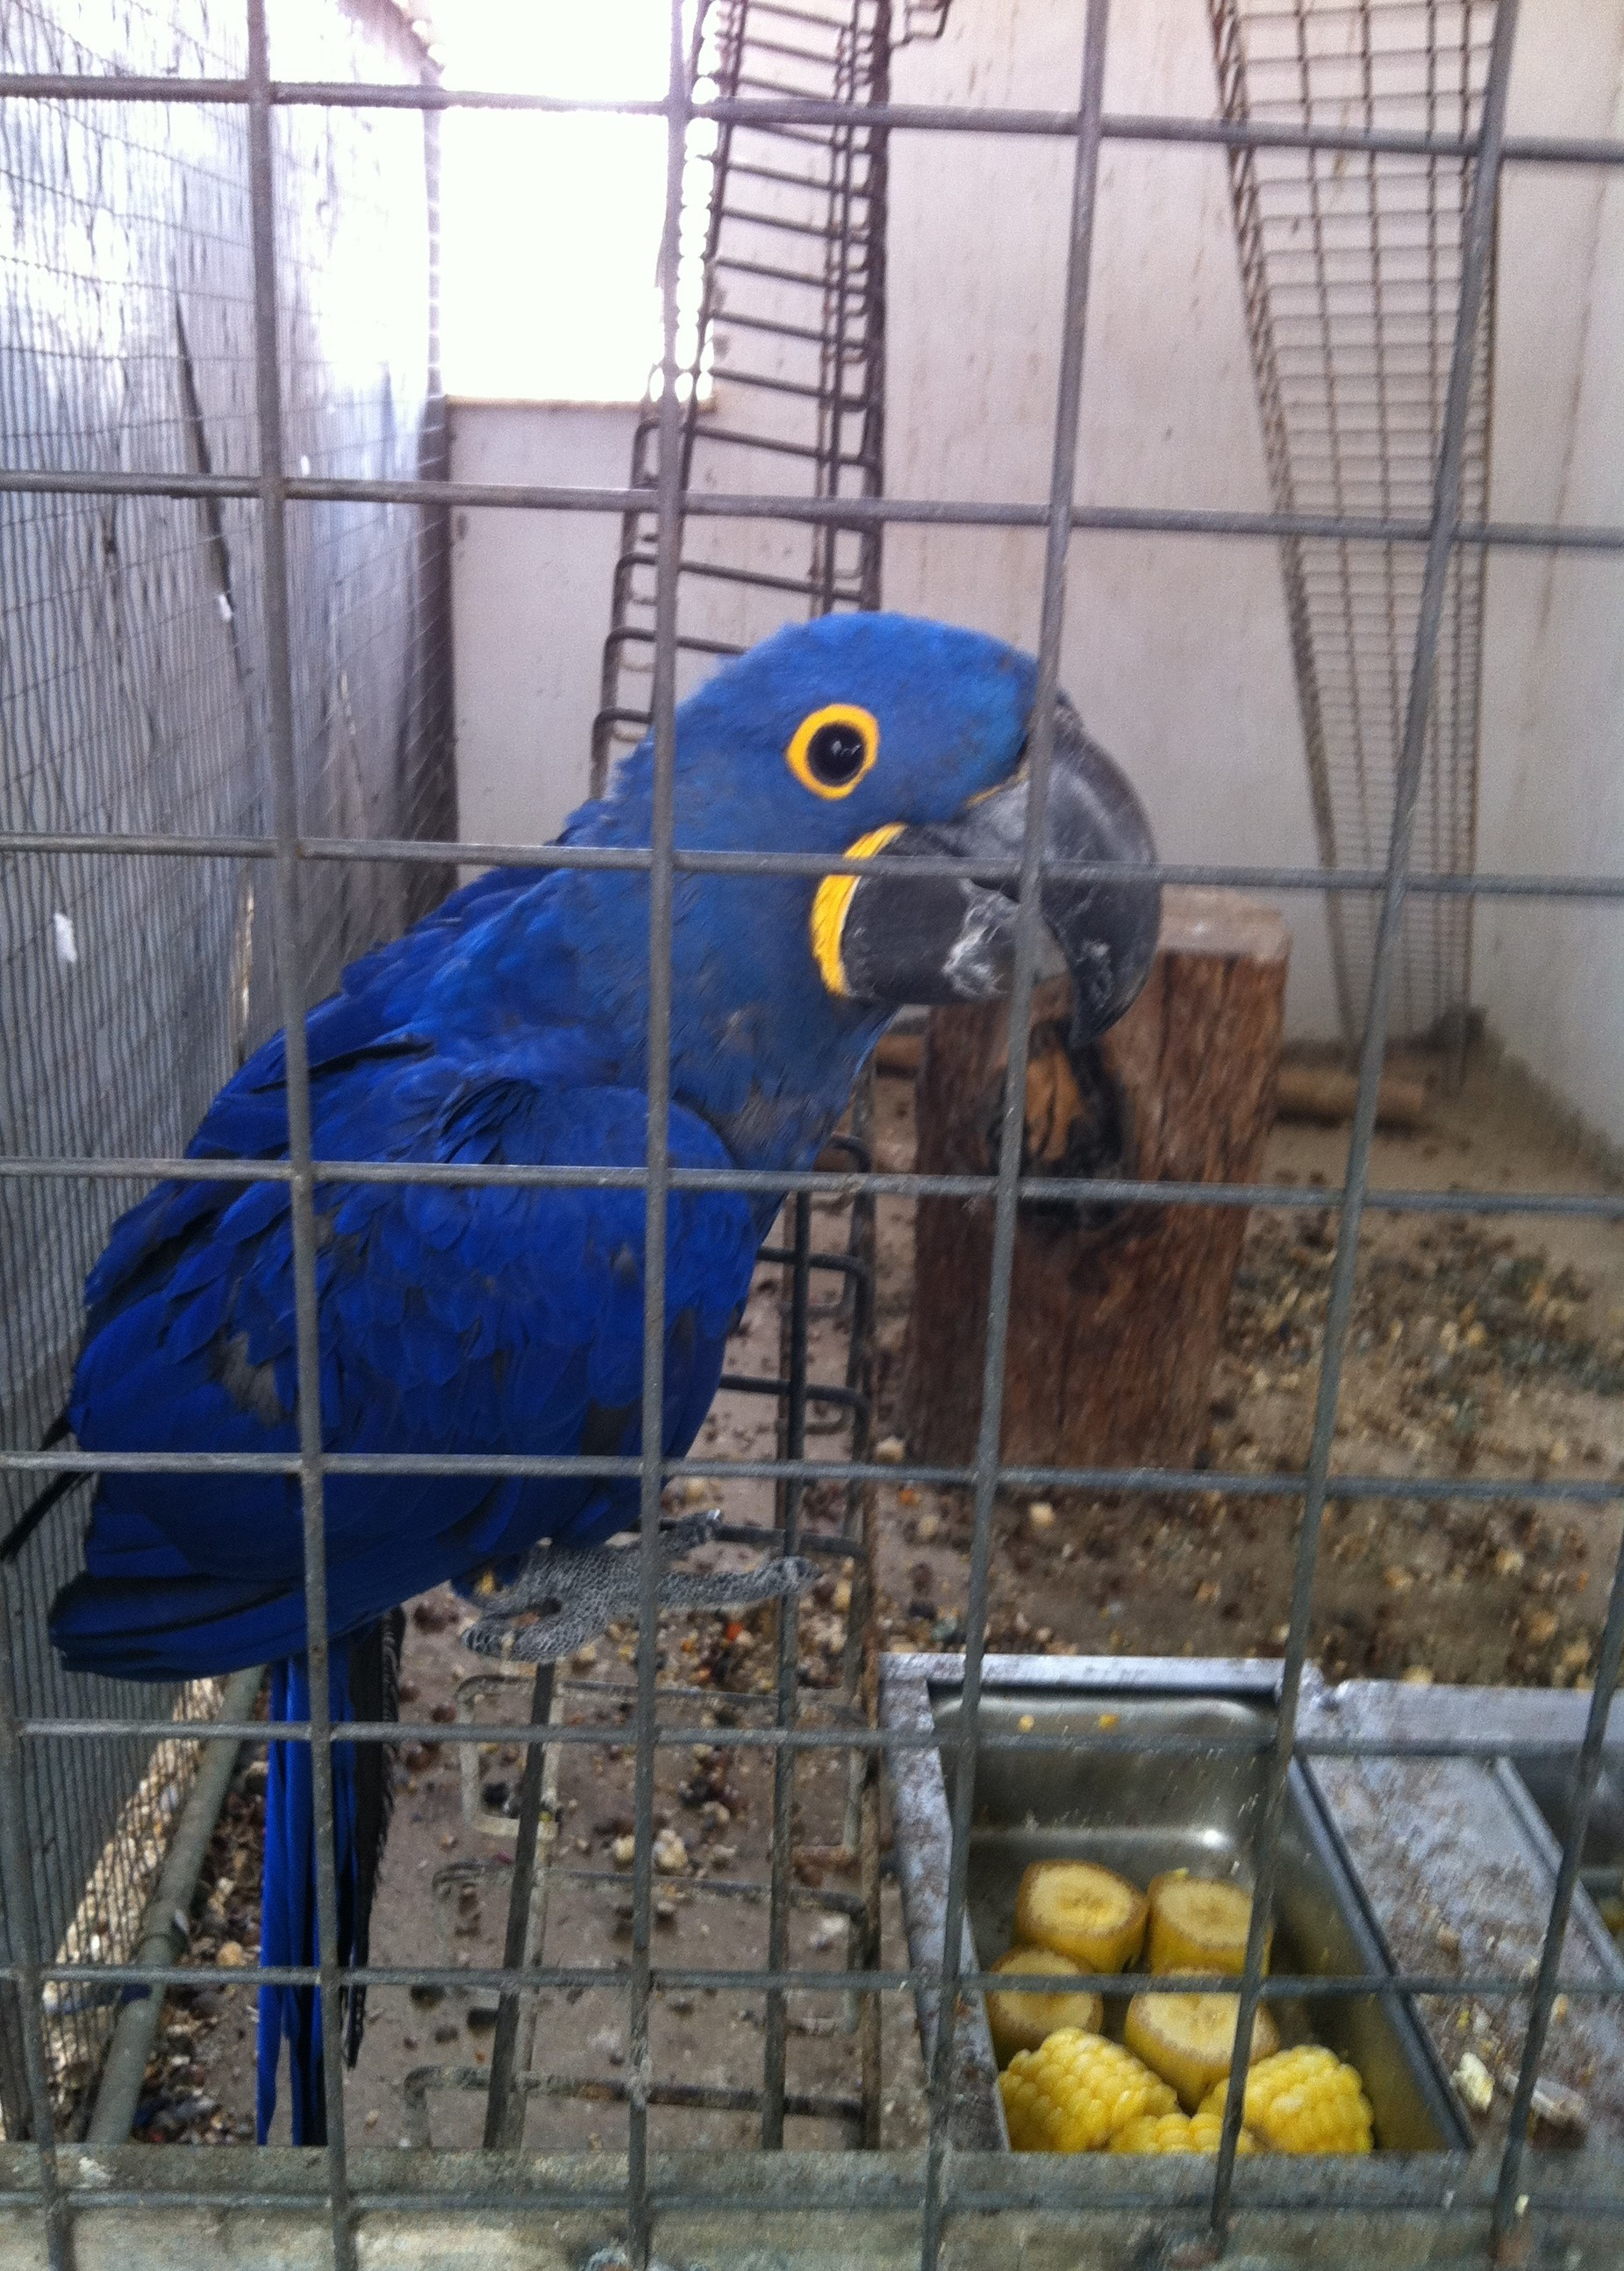 MACAW BLUE